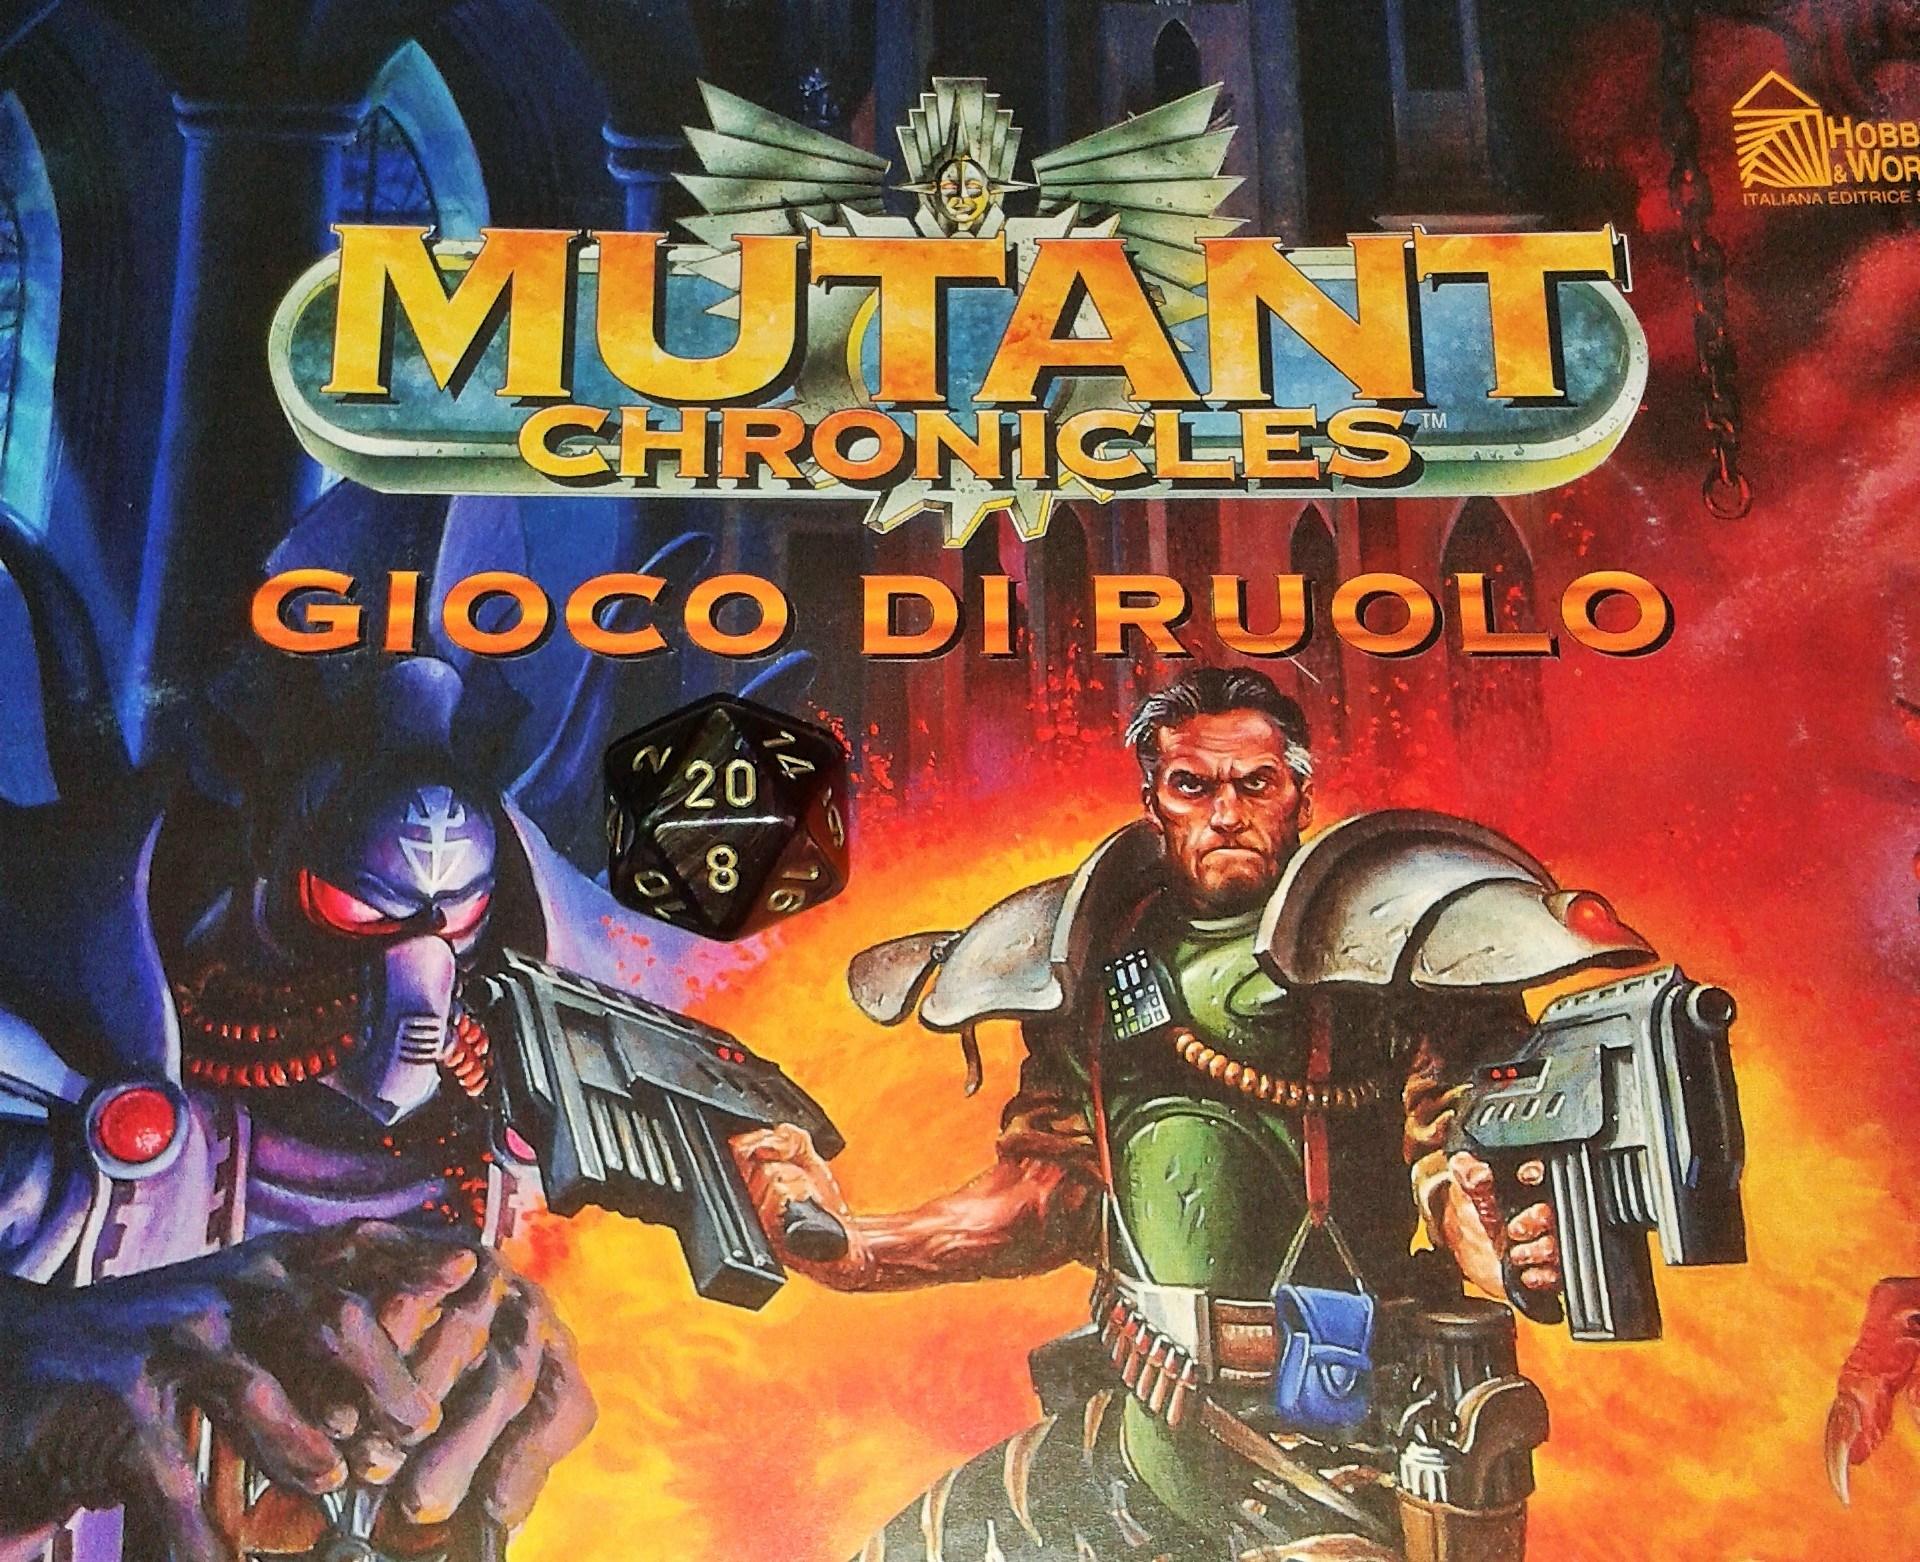 Mutant Chronicles: ambientazione cyberpunk per videogame e giochi di ruolo 1 Iyezine.com